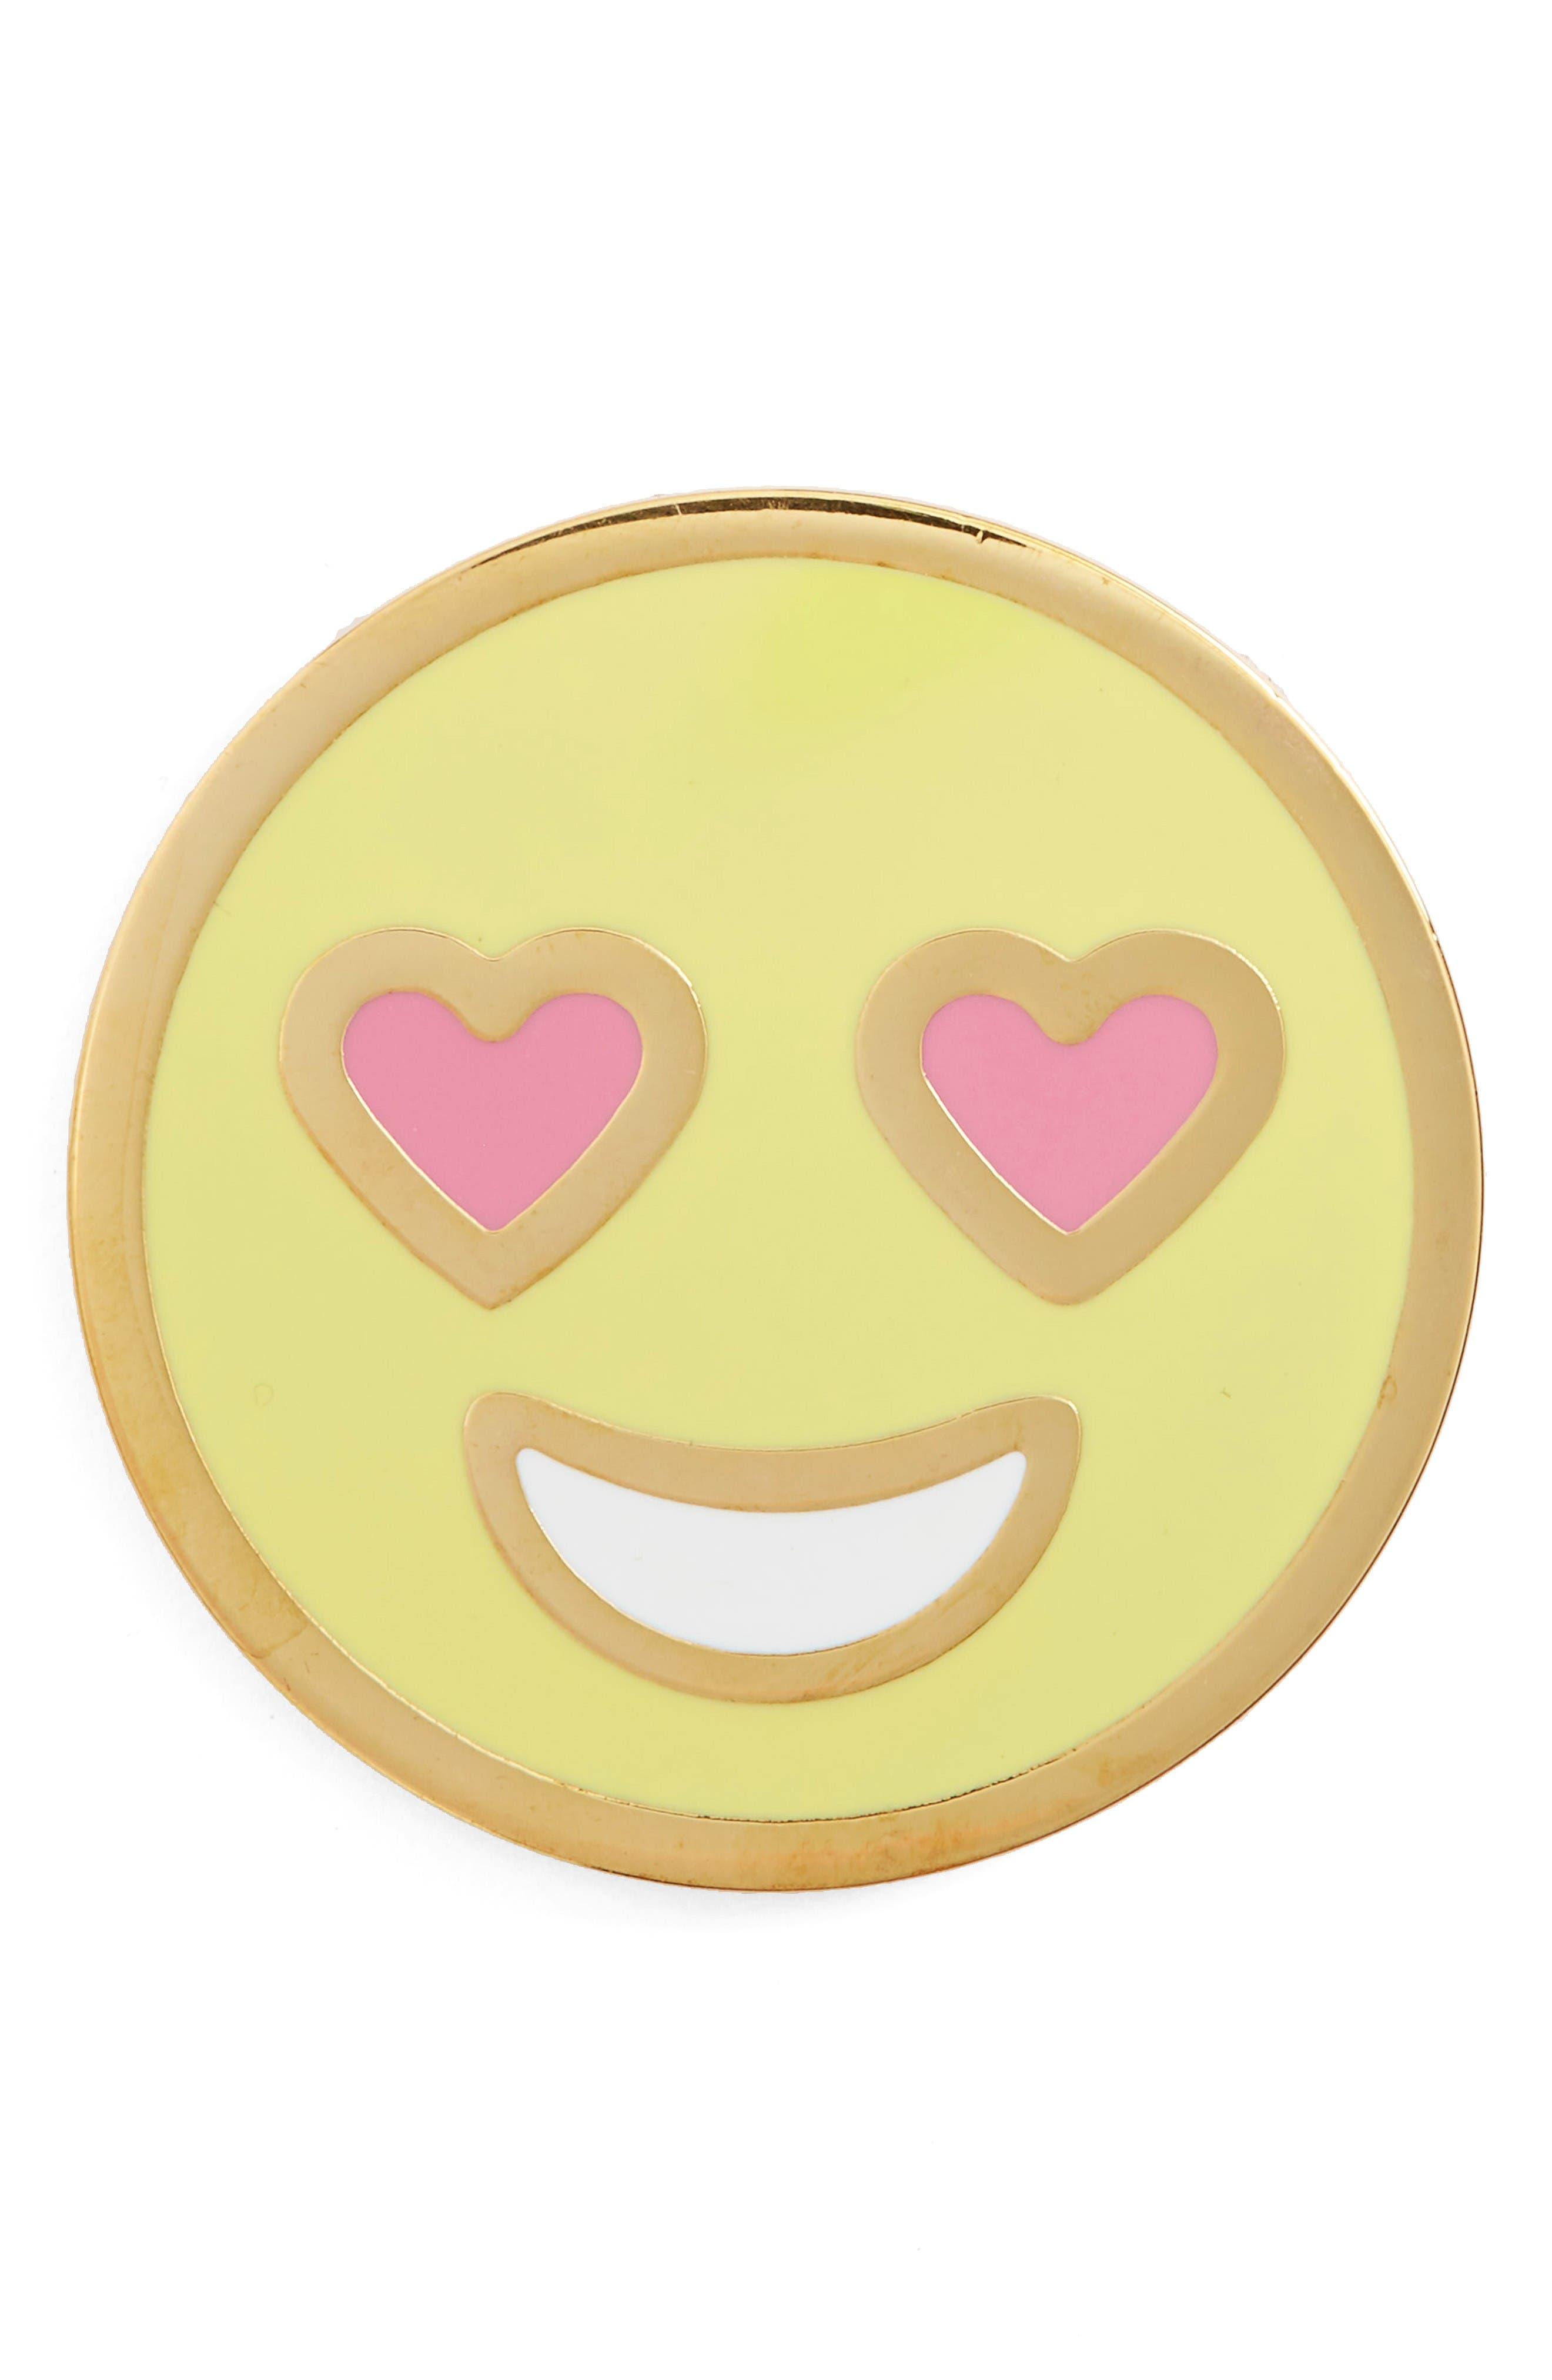 Main Image - Stoney Clover Lane Enamel Heart Eyes Smiley Pin